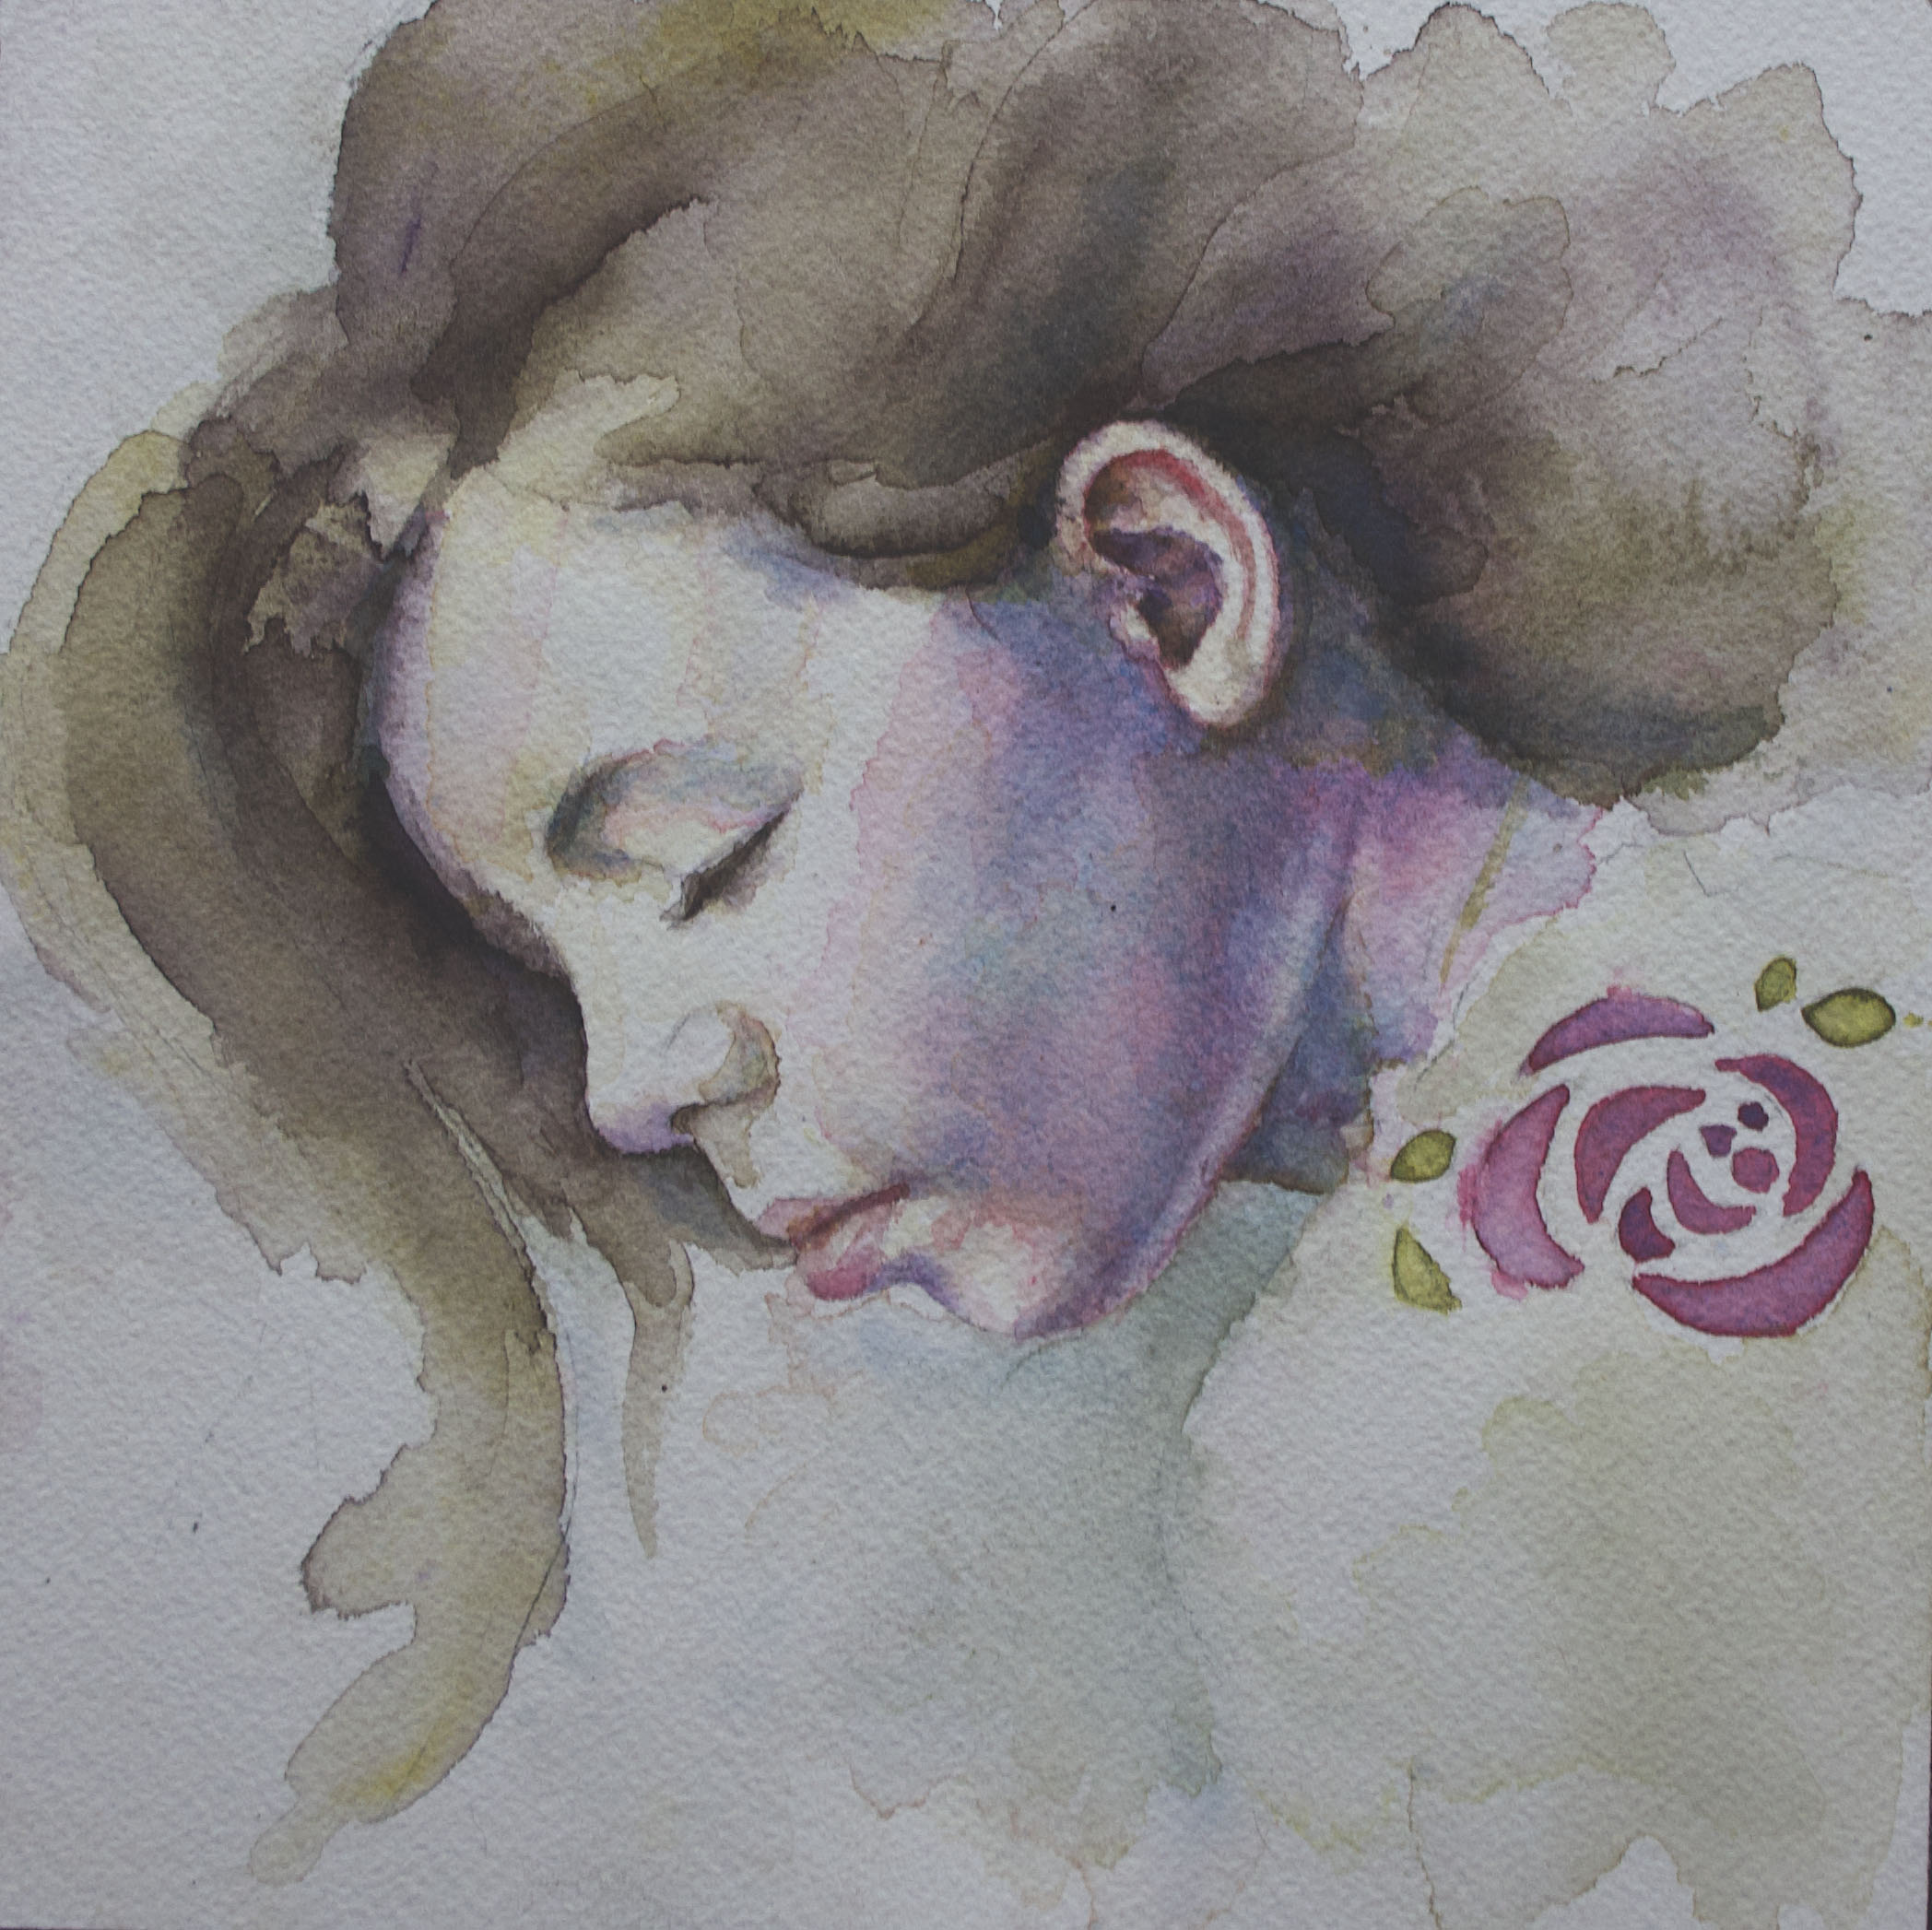 Newbery rose